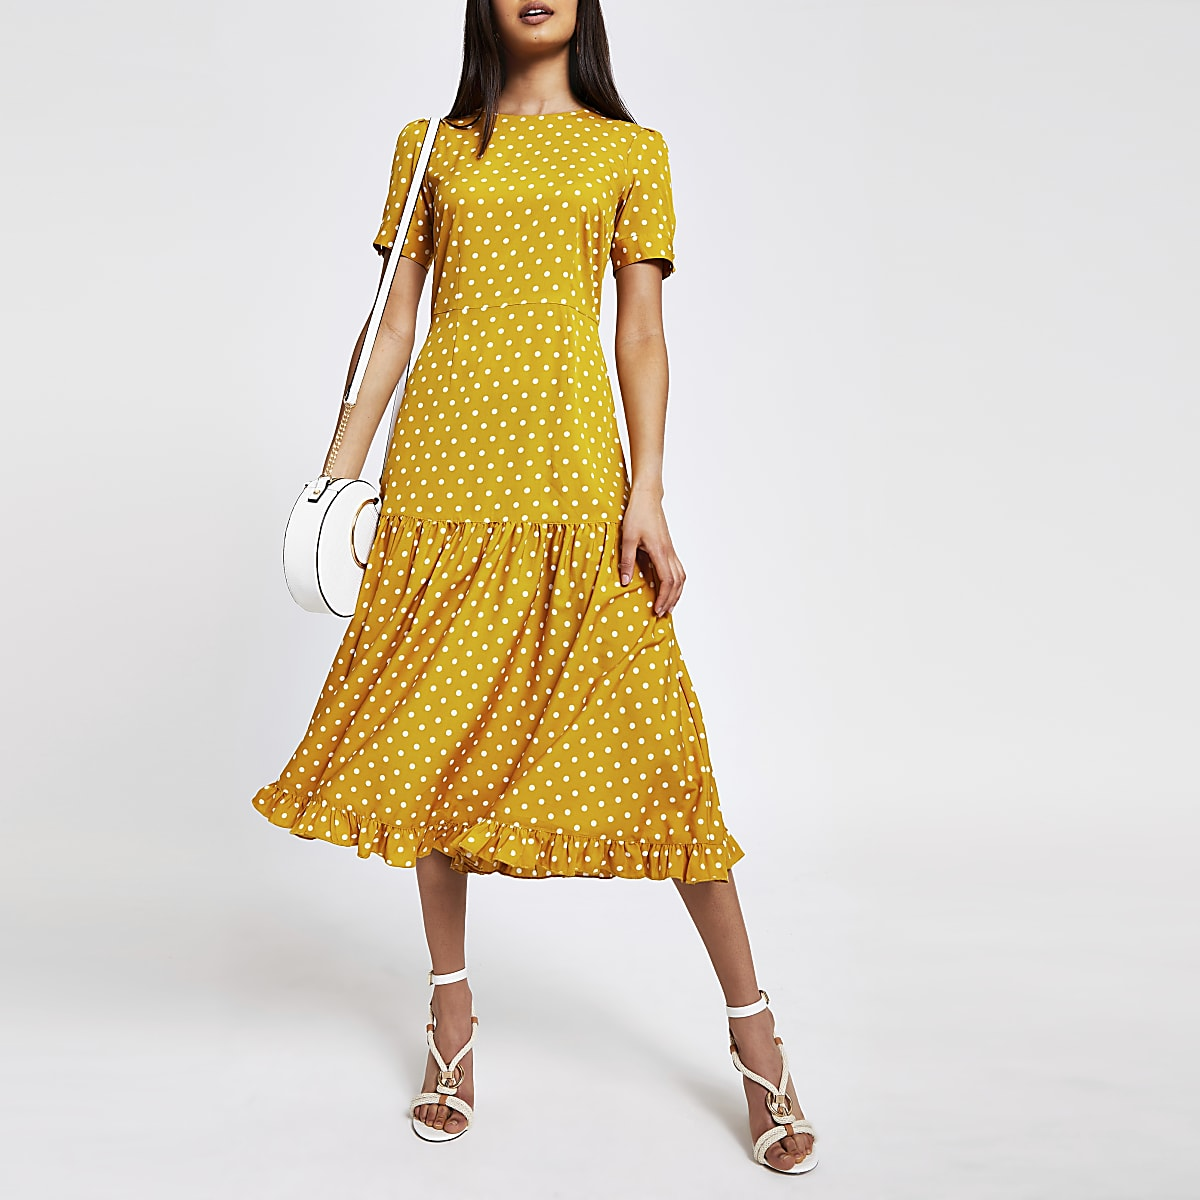 d2d4b4abe35b Yellow spot midi dress - Swing Dresses - Dresses - women